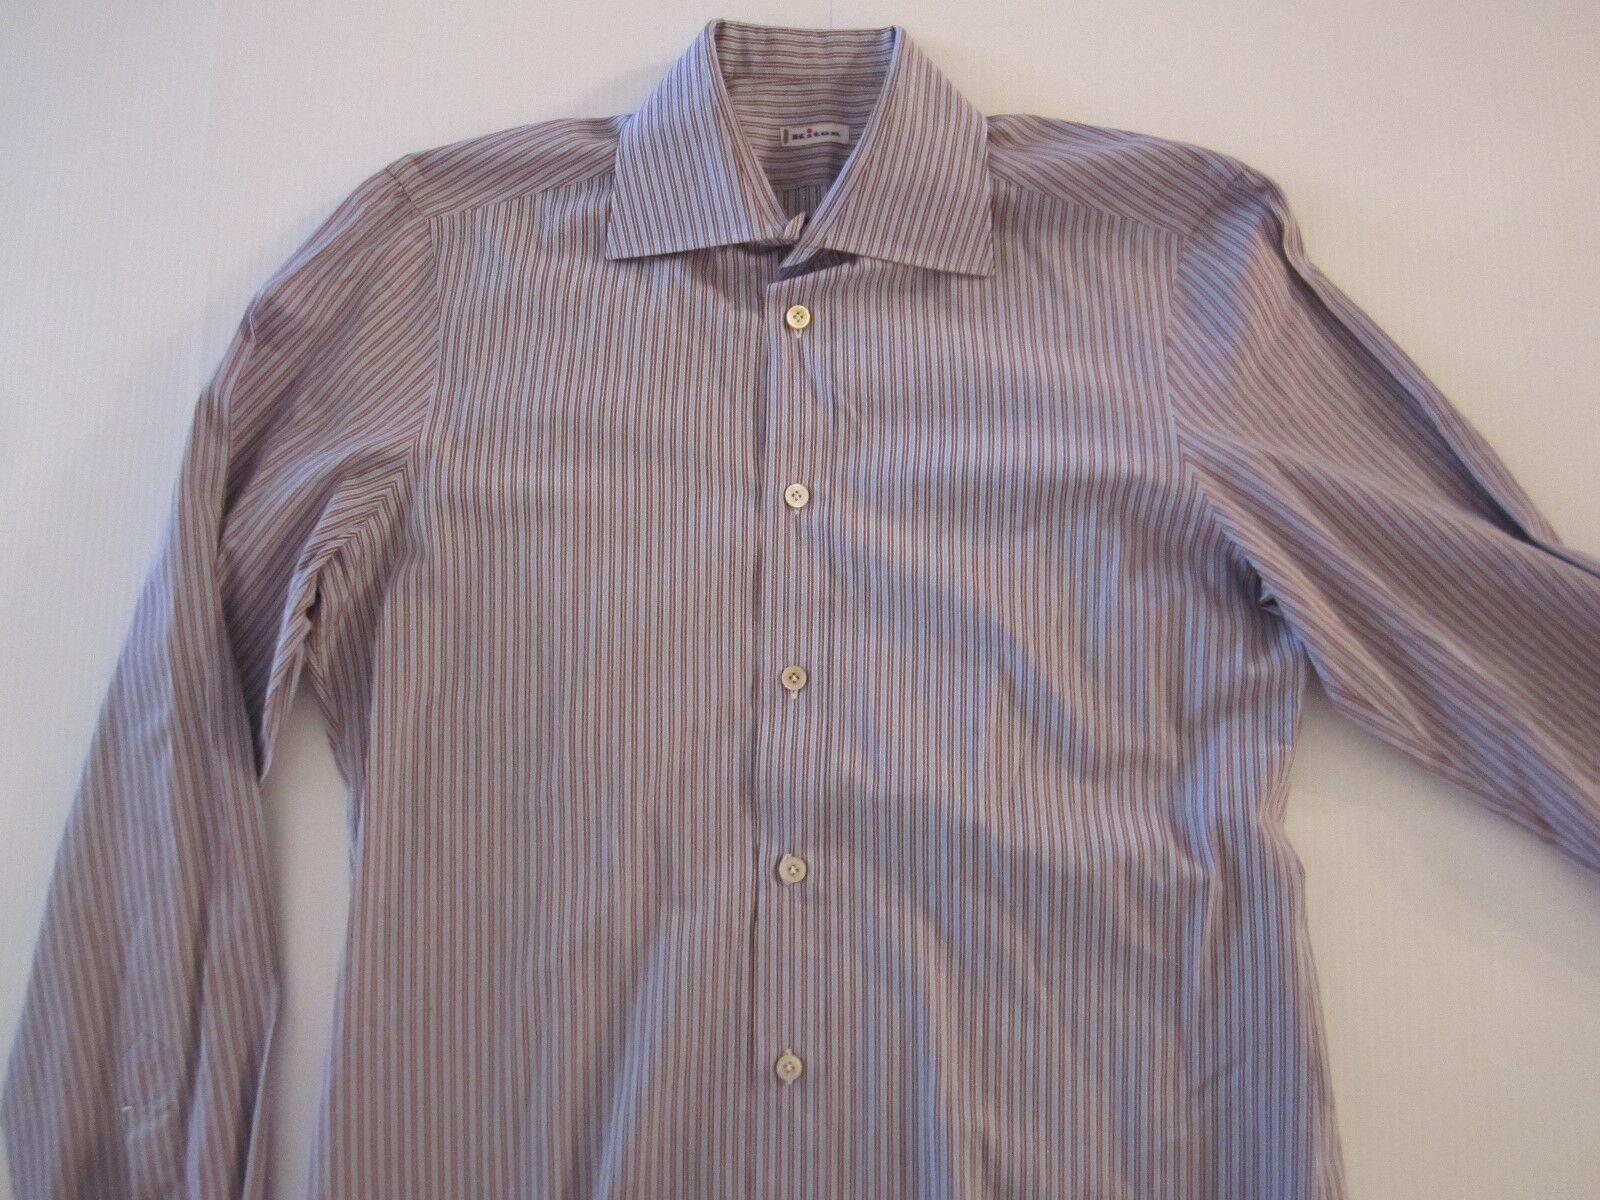 KITON NAPOLI bluee & Burgundy Stripe Handmade Dress Shirt  16 AMAZING